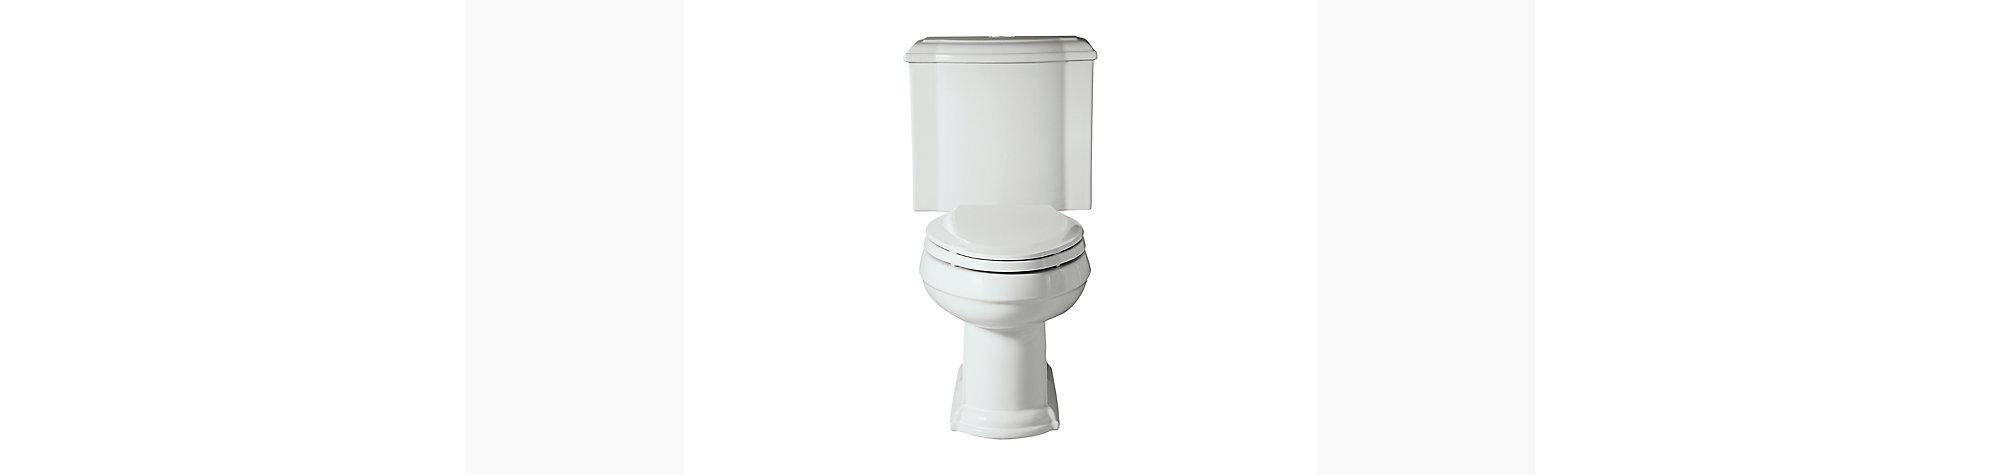 Devonshire & Tresham Close Coupled Toilet Pan